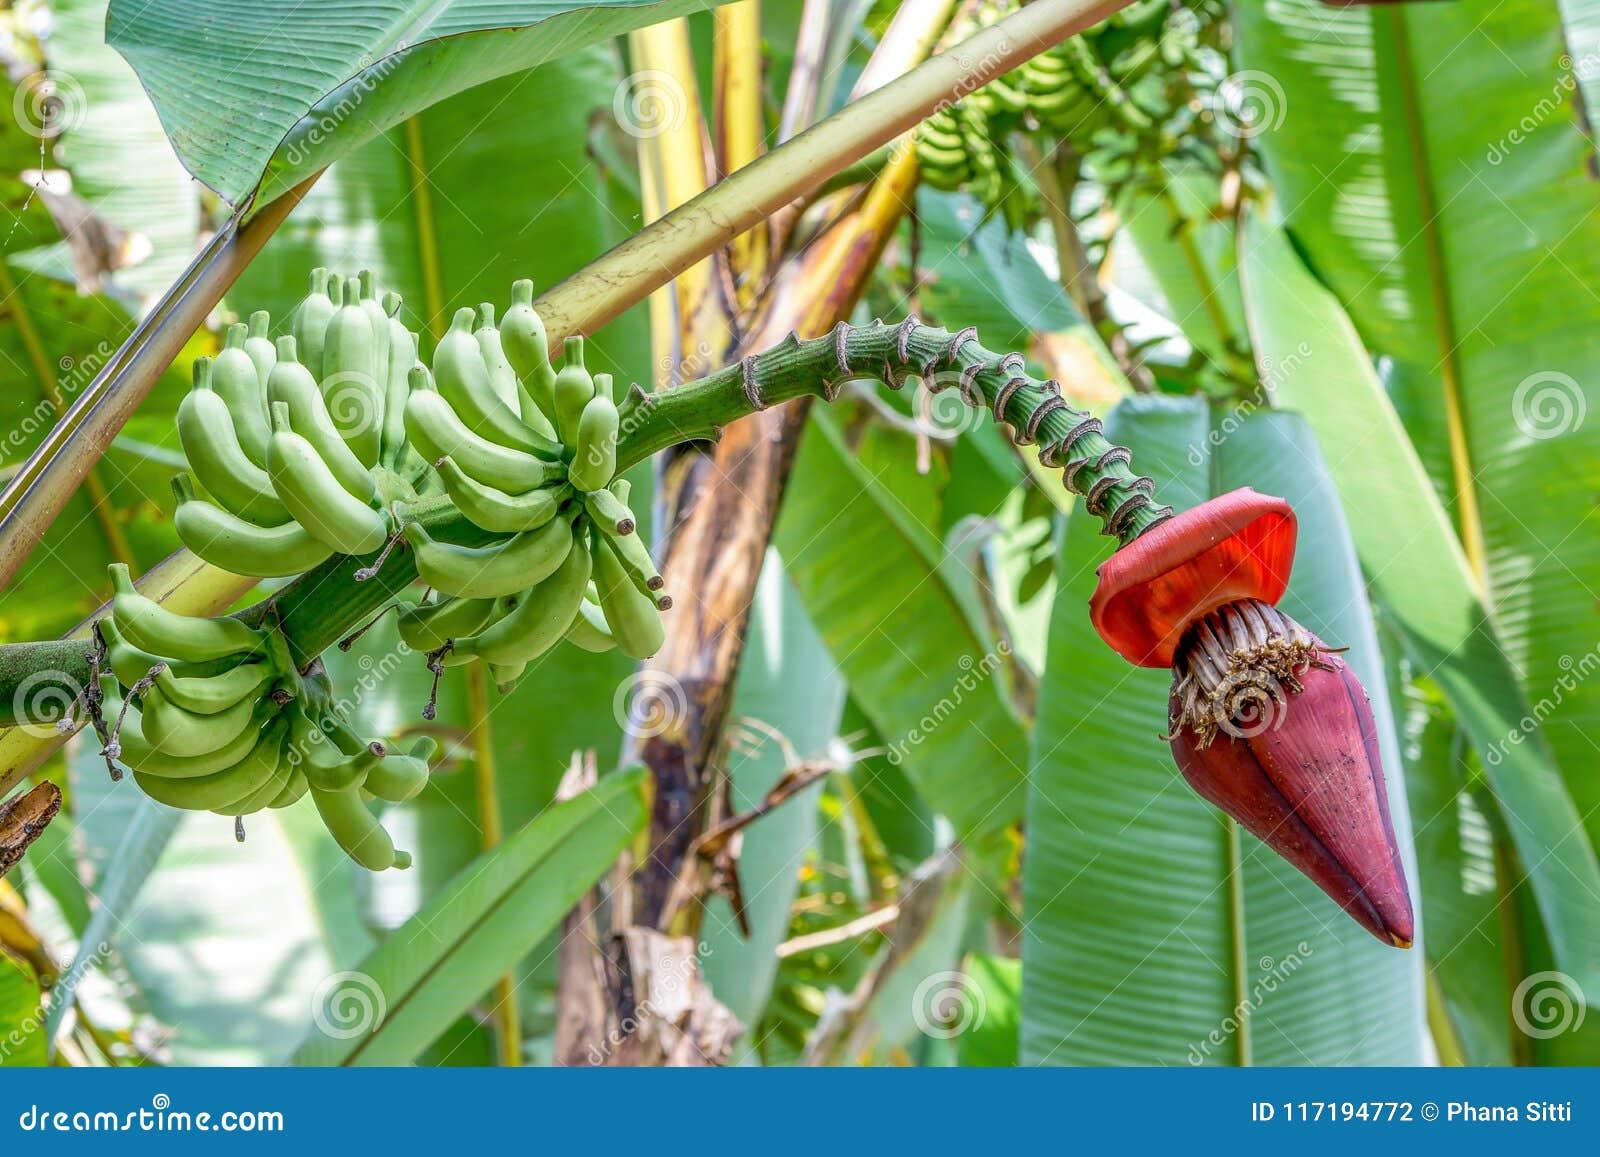 Banana Tree With Banana Blossom Stock Photo Image Of Musaceae